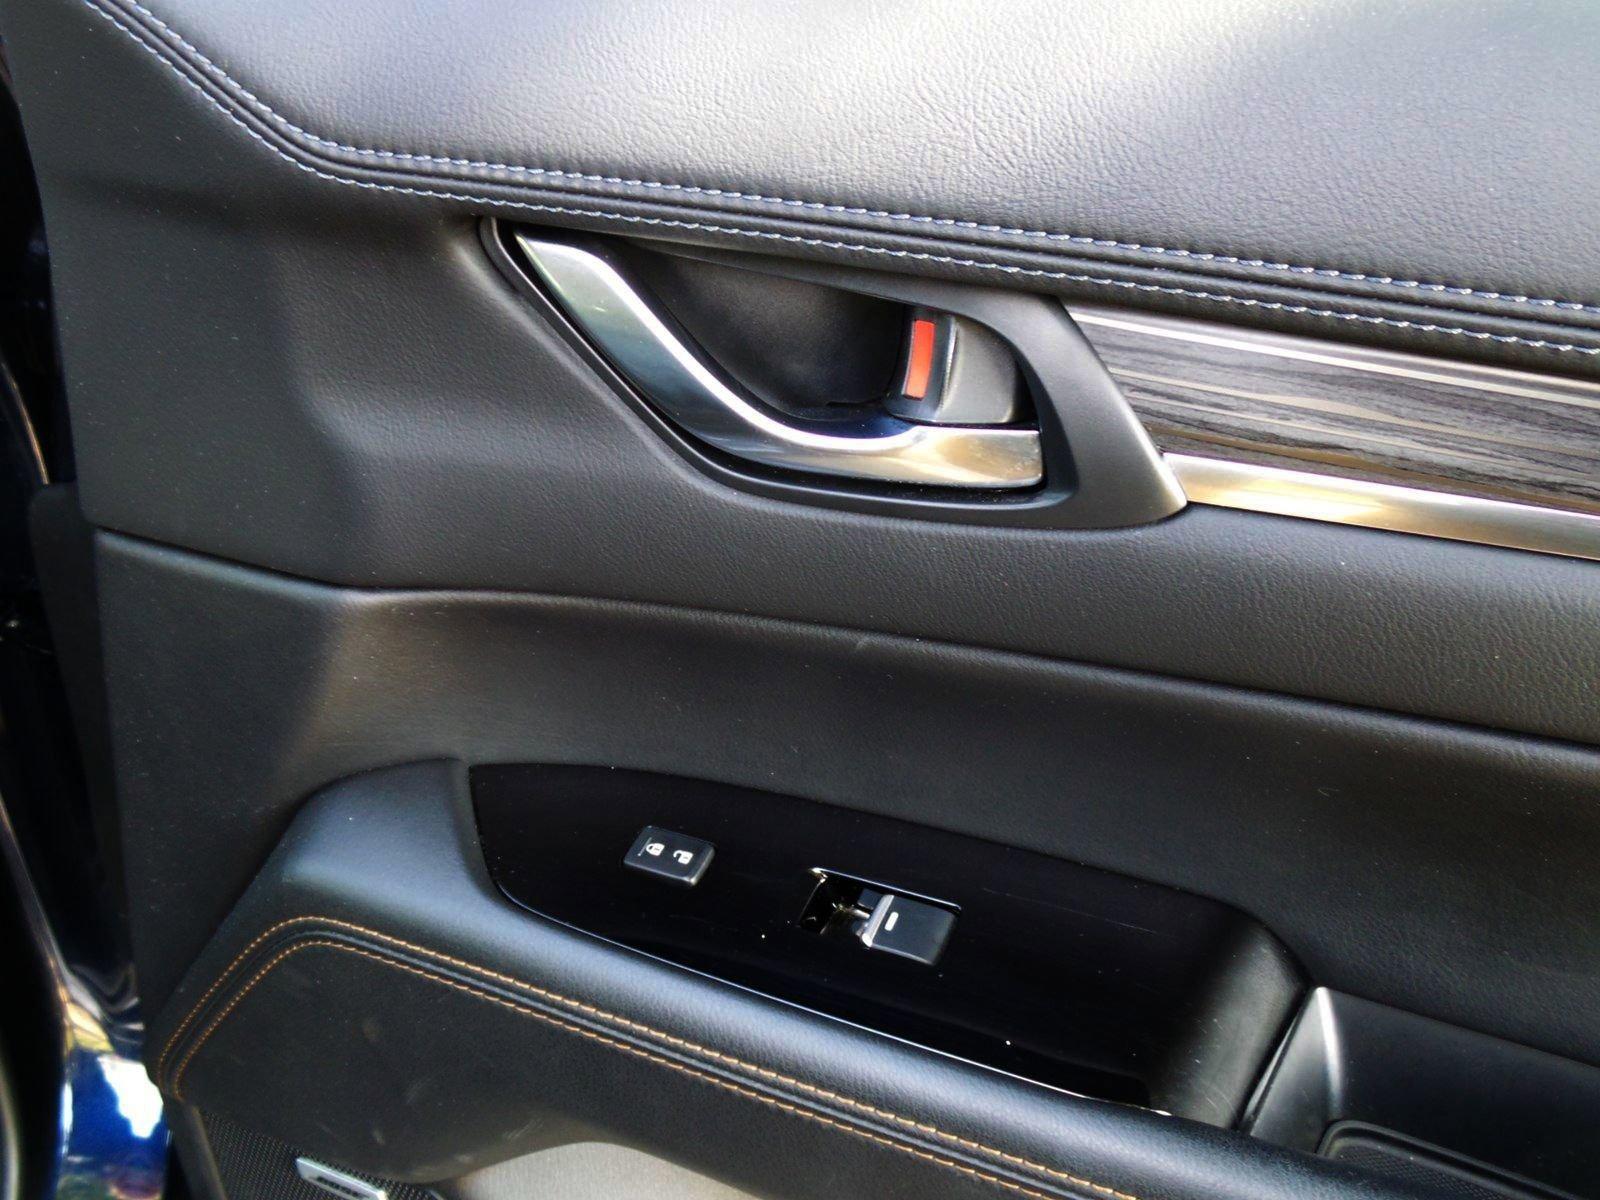 Pre-Owned 2019 Mazda CX-5 Grand Touring